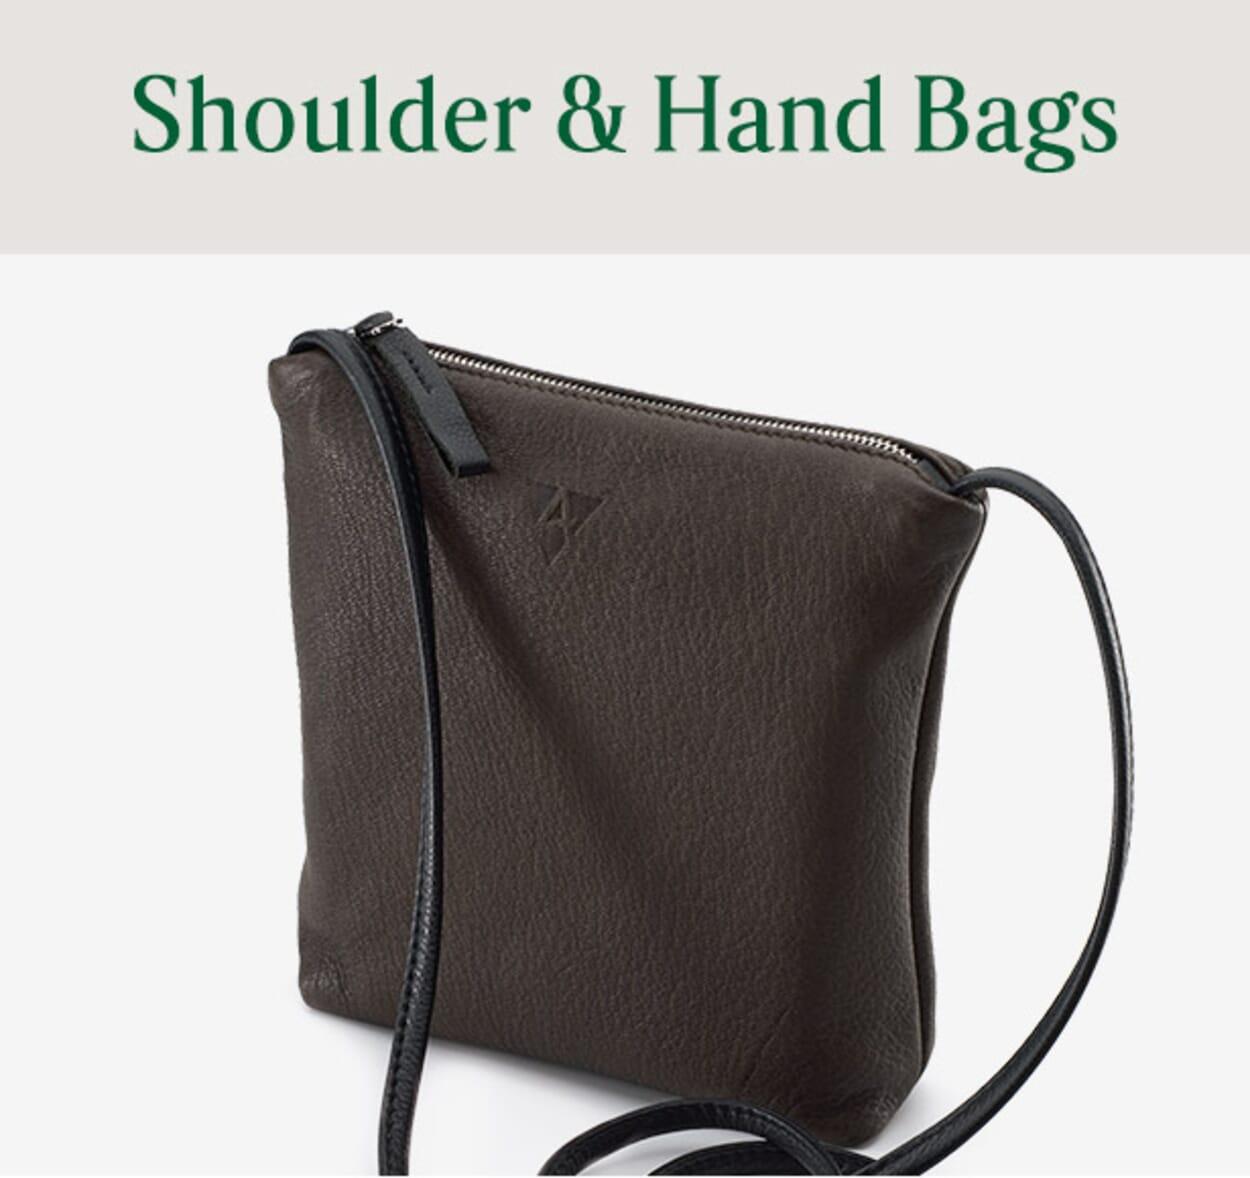 Shoulder & Hand Bags